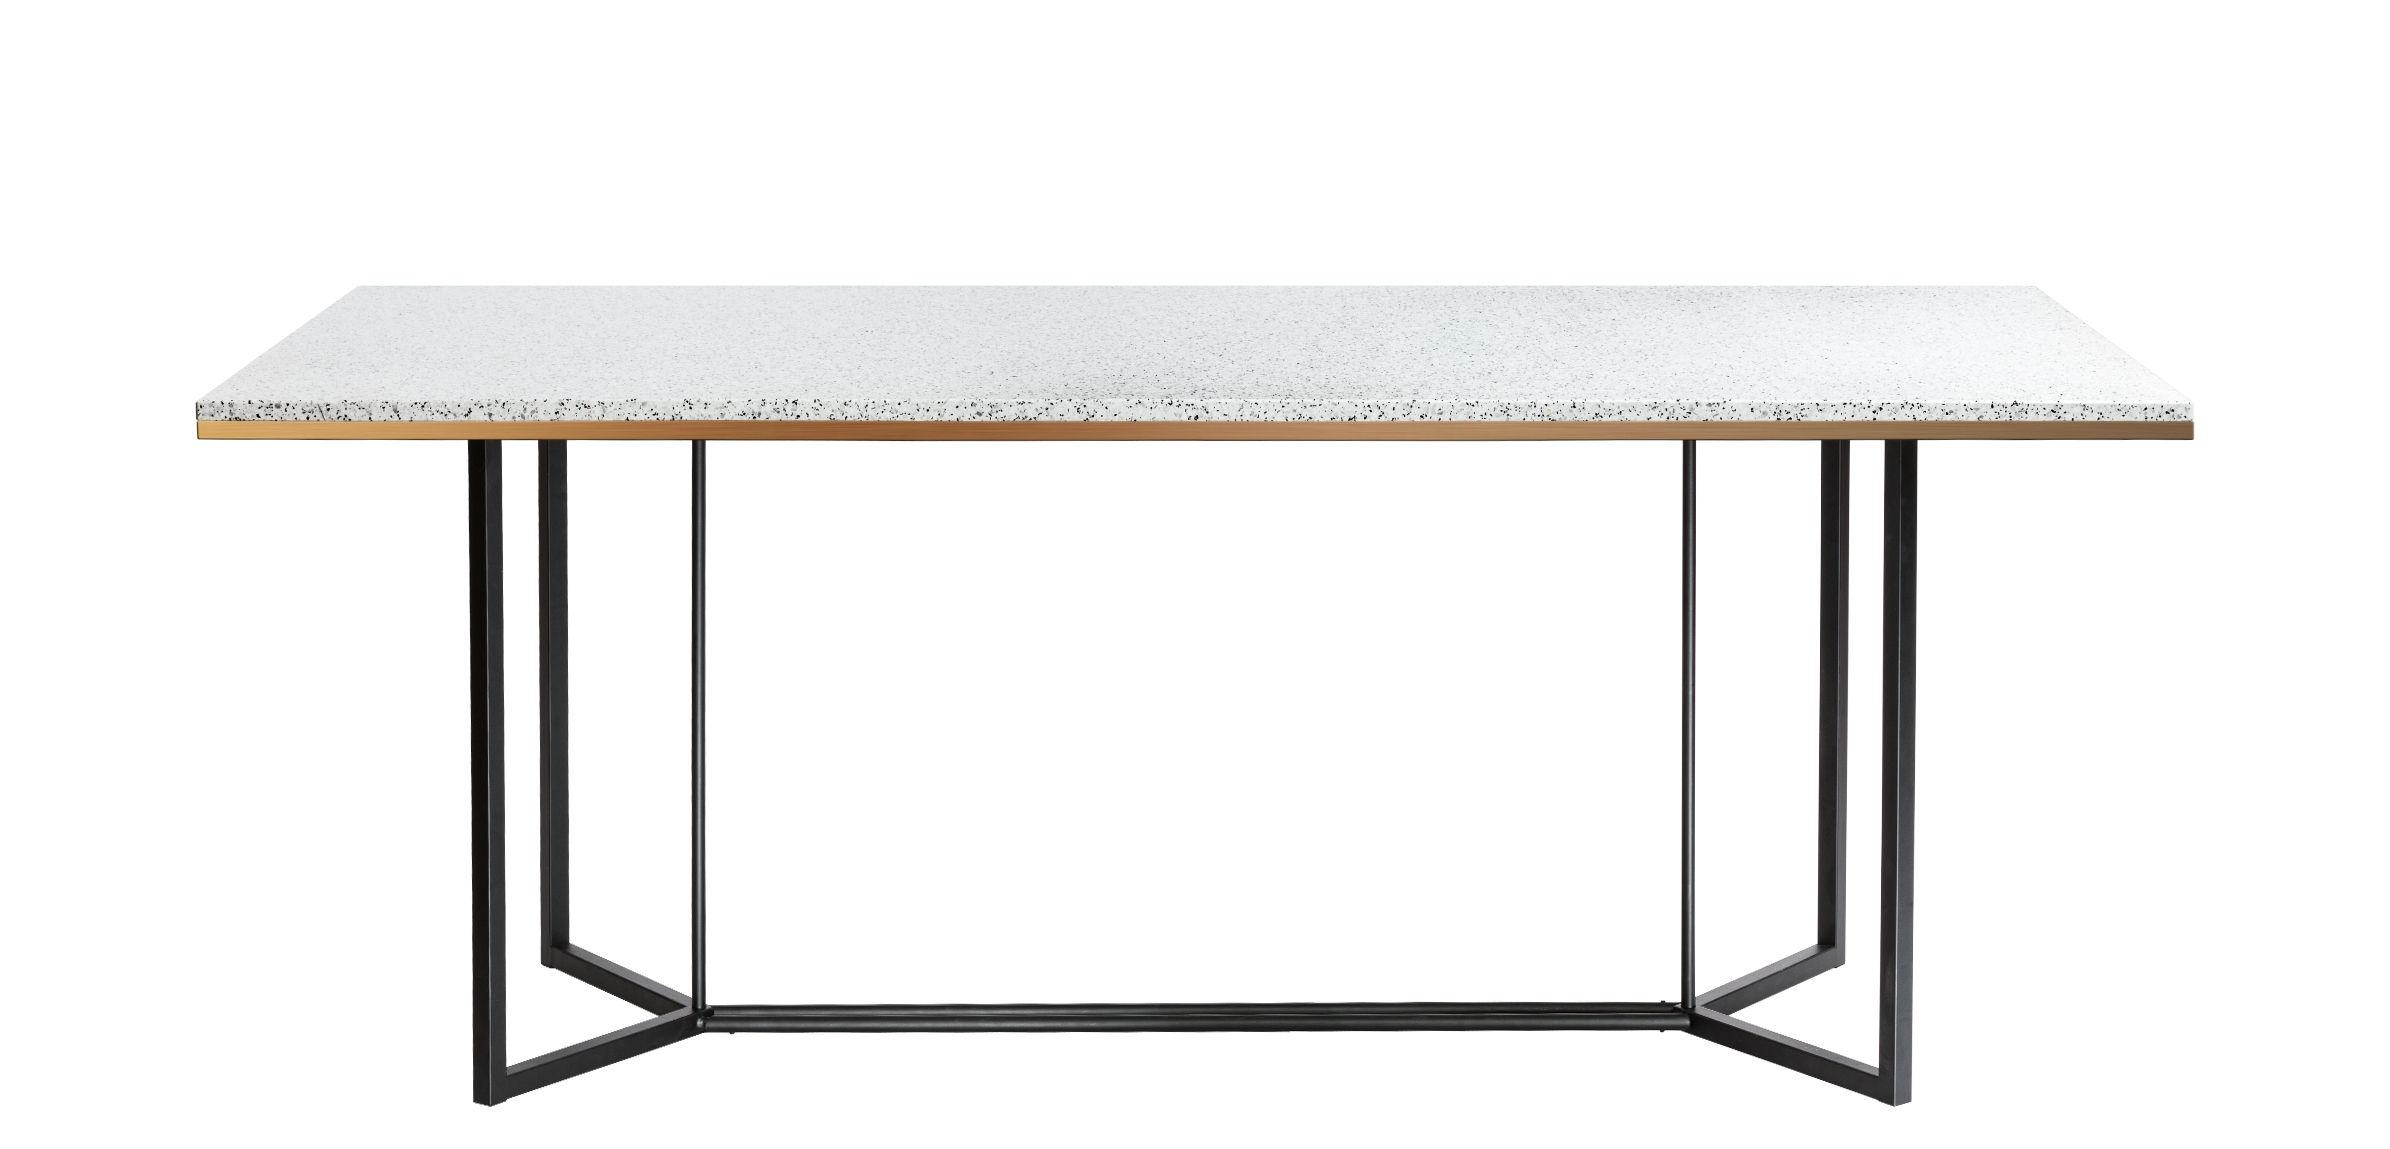 aktion - Moderne Natur - Terrazzo Tisch / 190 x 90 cm - RED Edition - Weiß - Holz, lackierter Stahl, Messing, Terrazzo